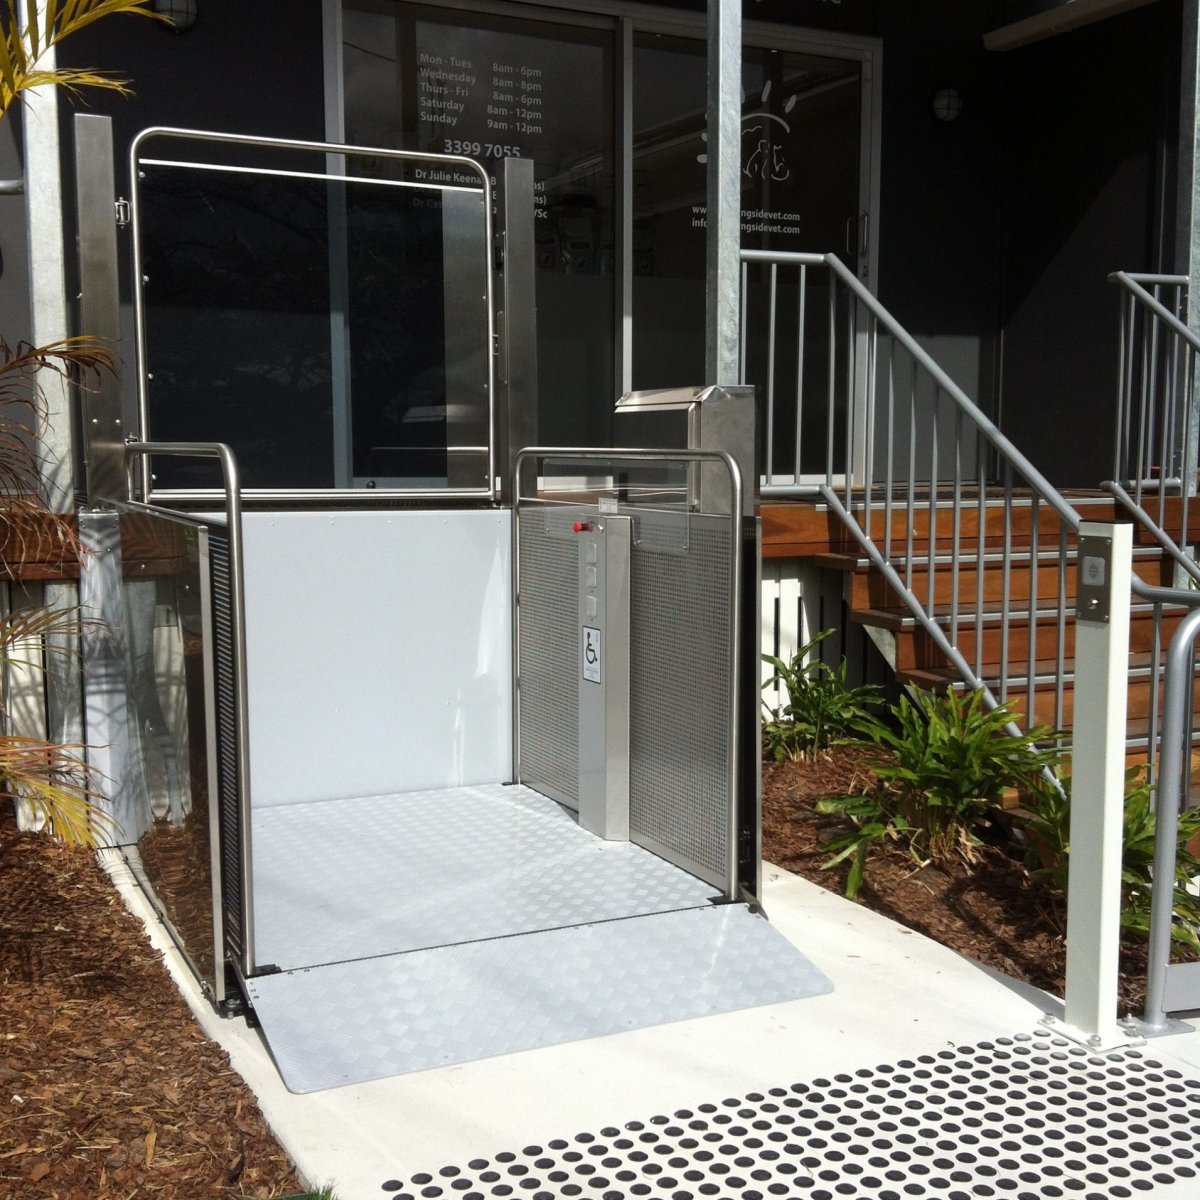 Vertical Platform Lift outside vet Platform Lifts | Simplex Elevators Gallery Image 3